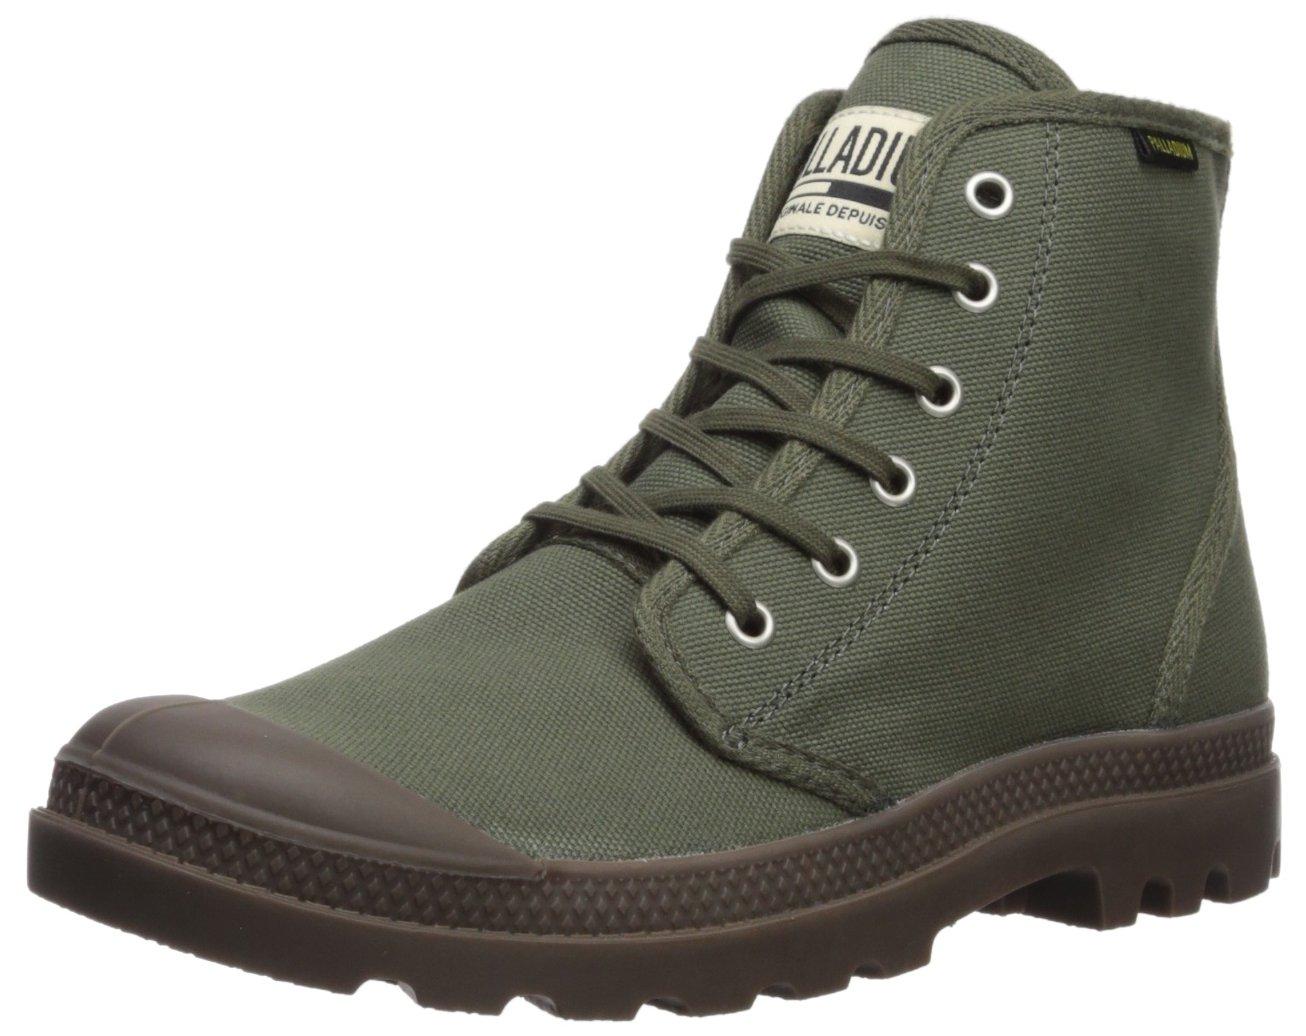 Palladium Pampa Hi Orginale Ankle Boot B074B46MH9 14 M US|Green-326